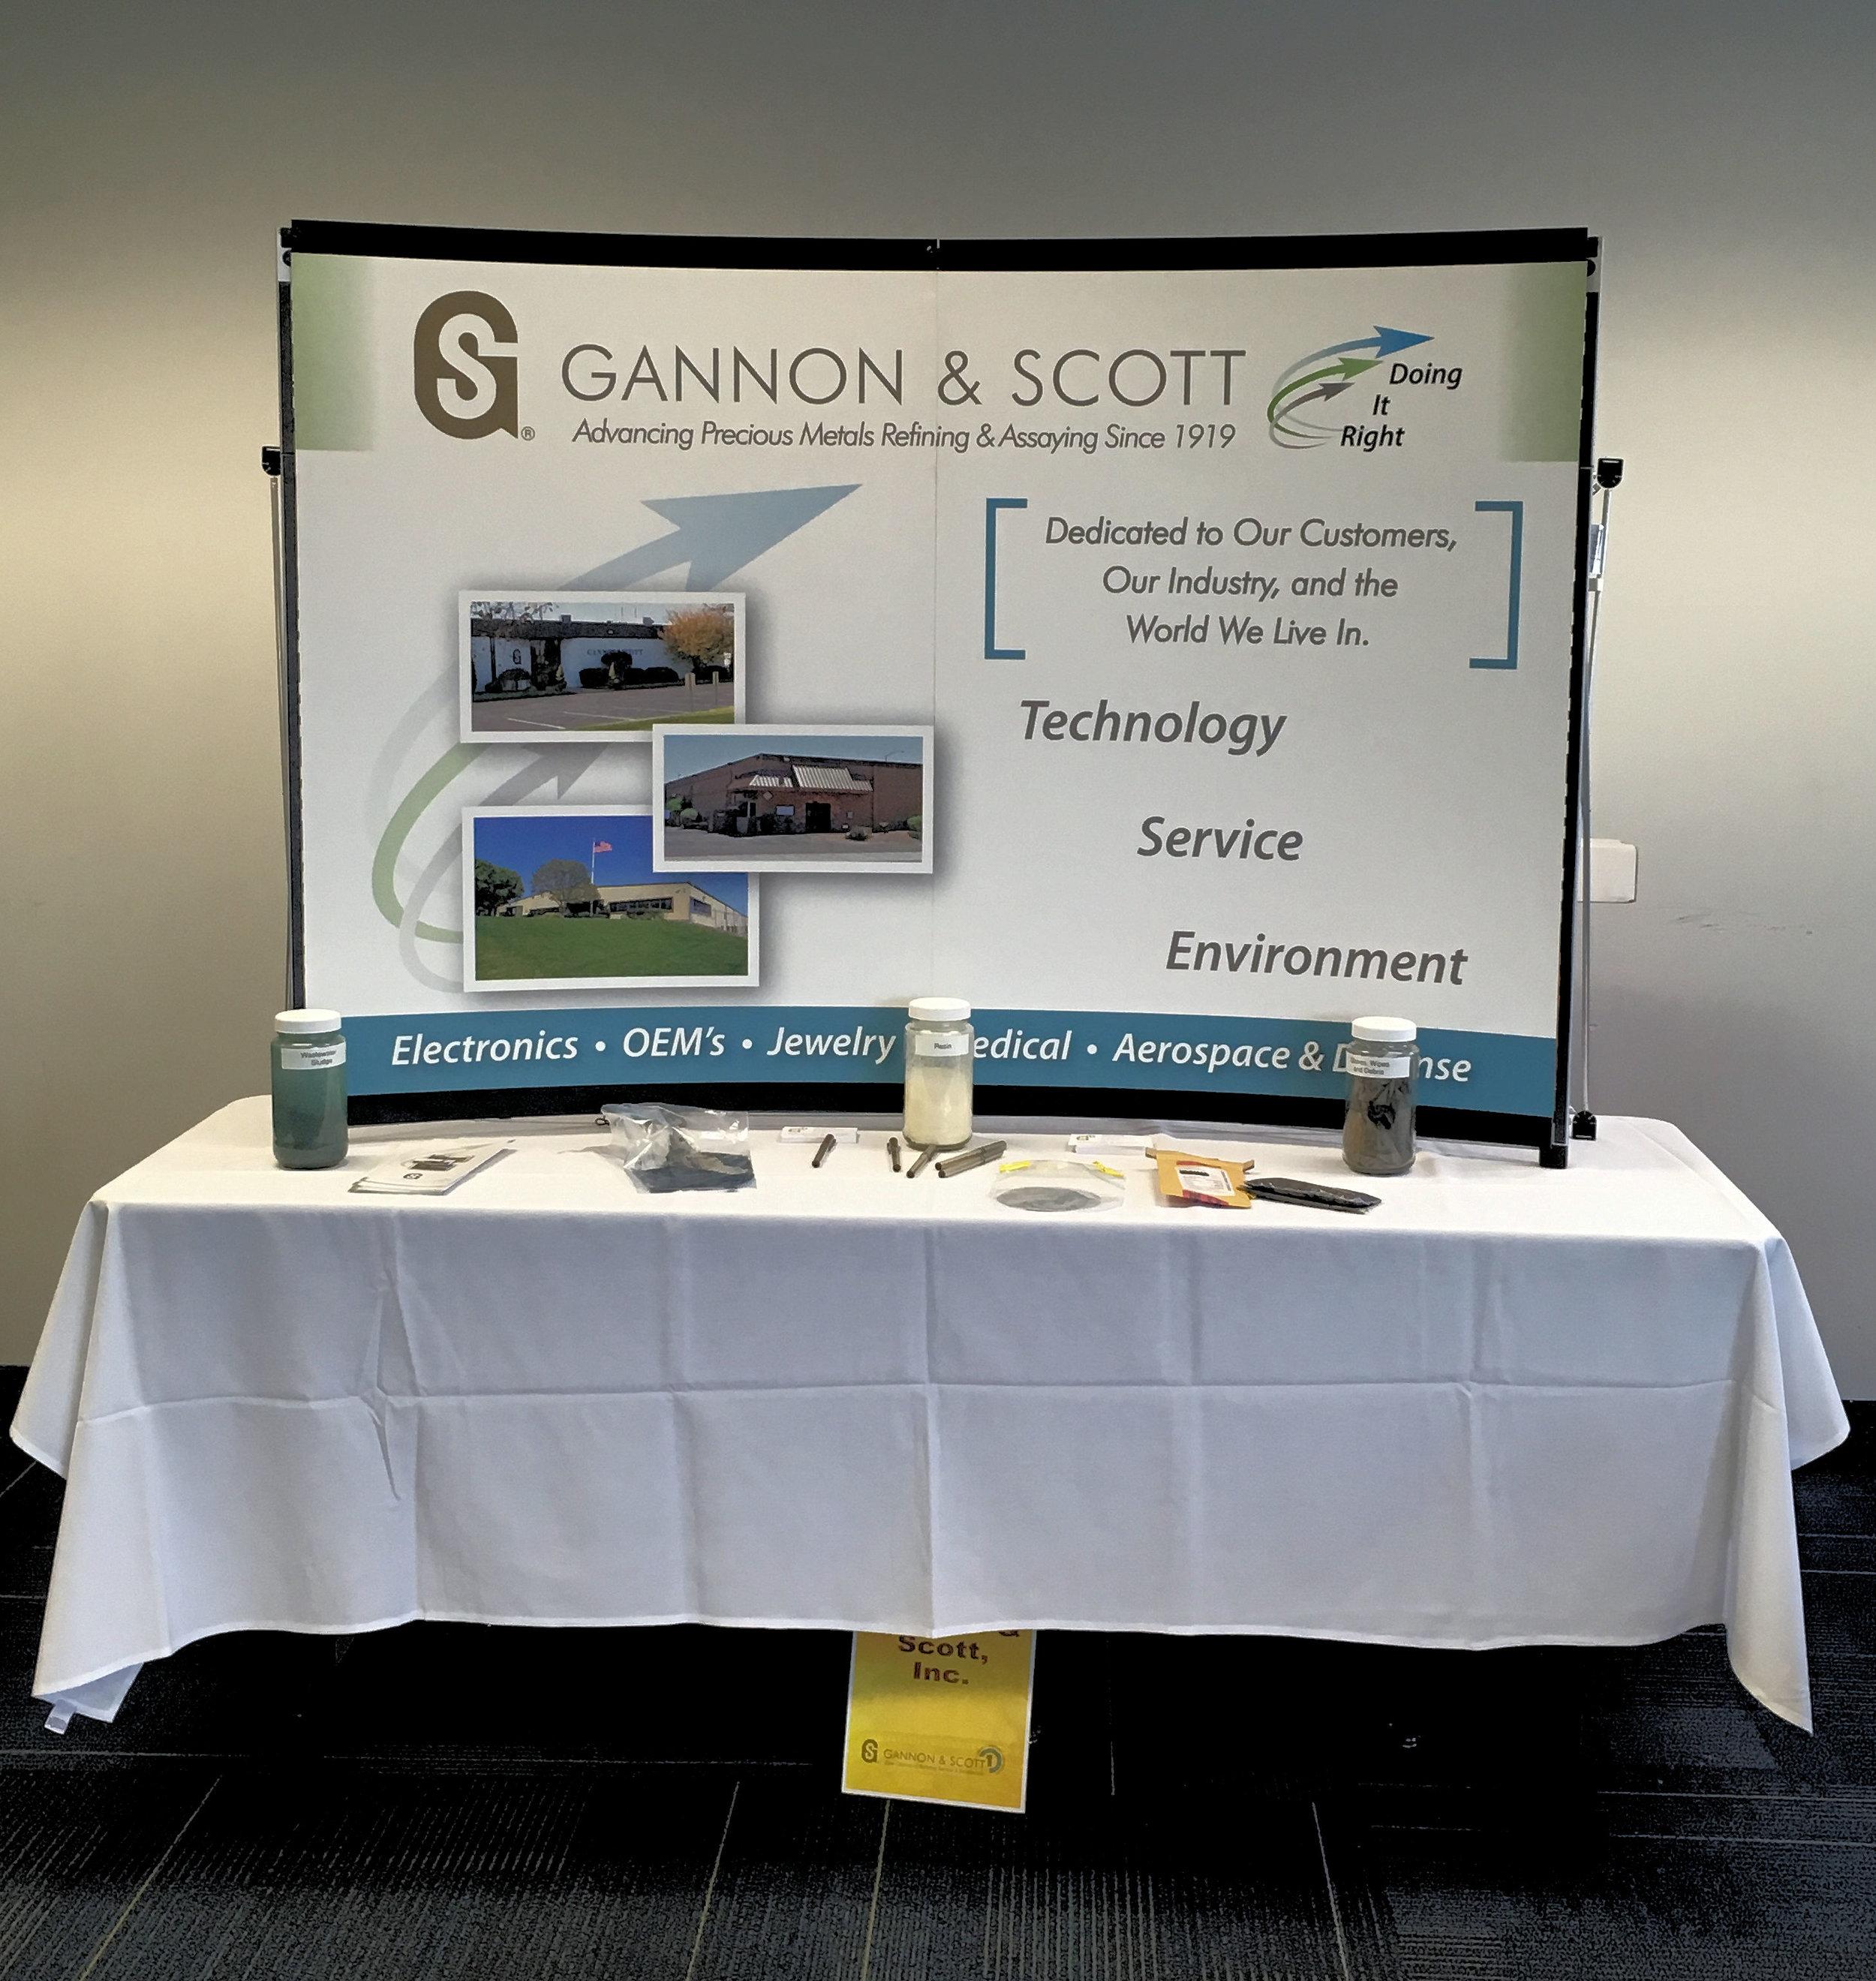 Gannon & Scott Exhibit